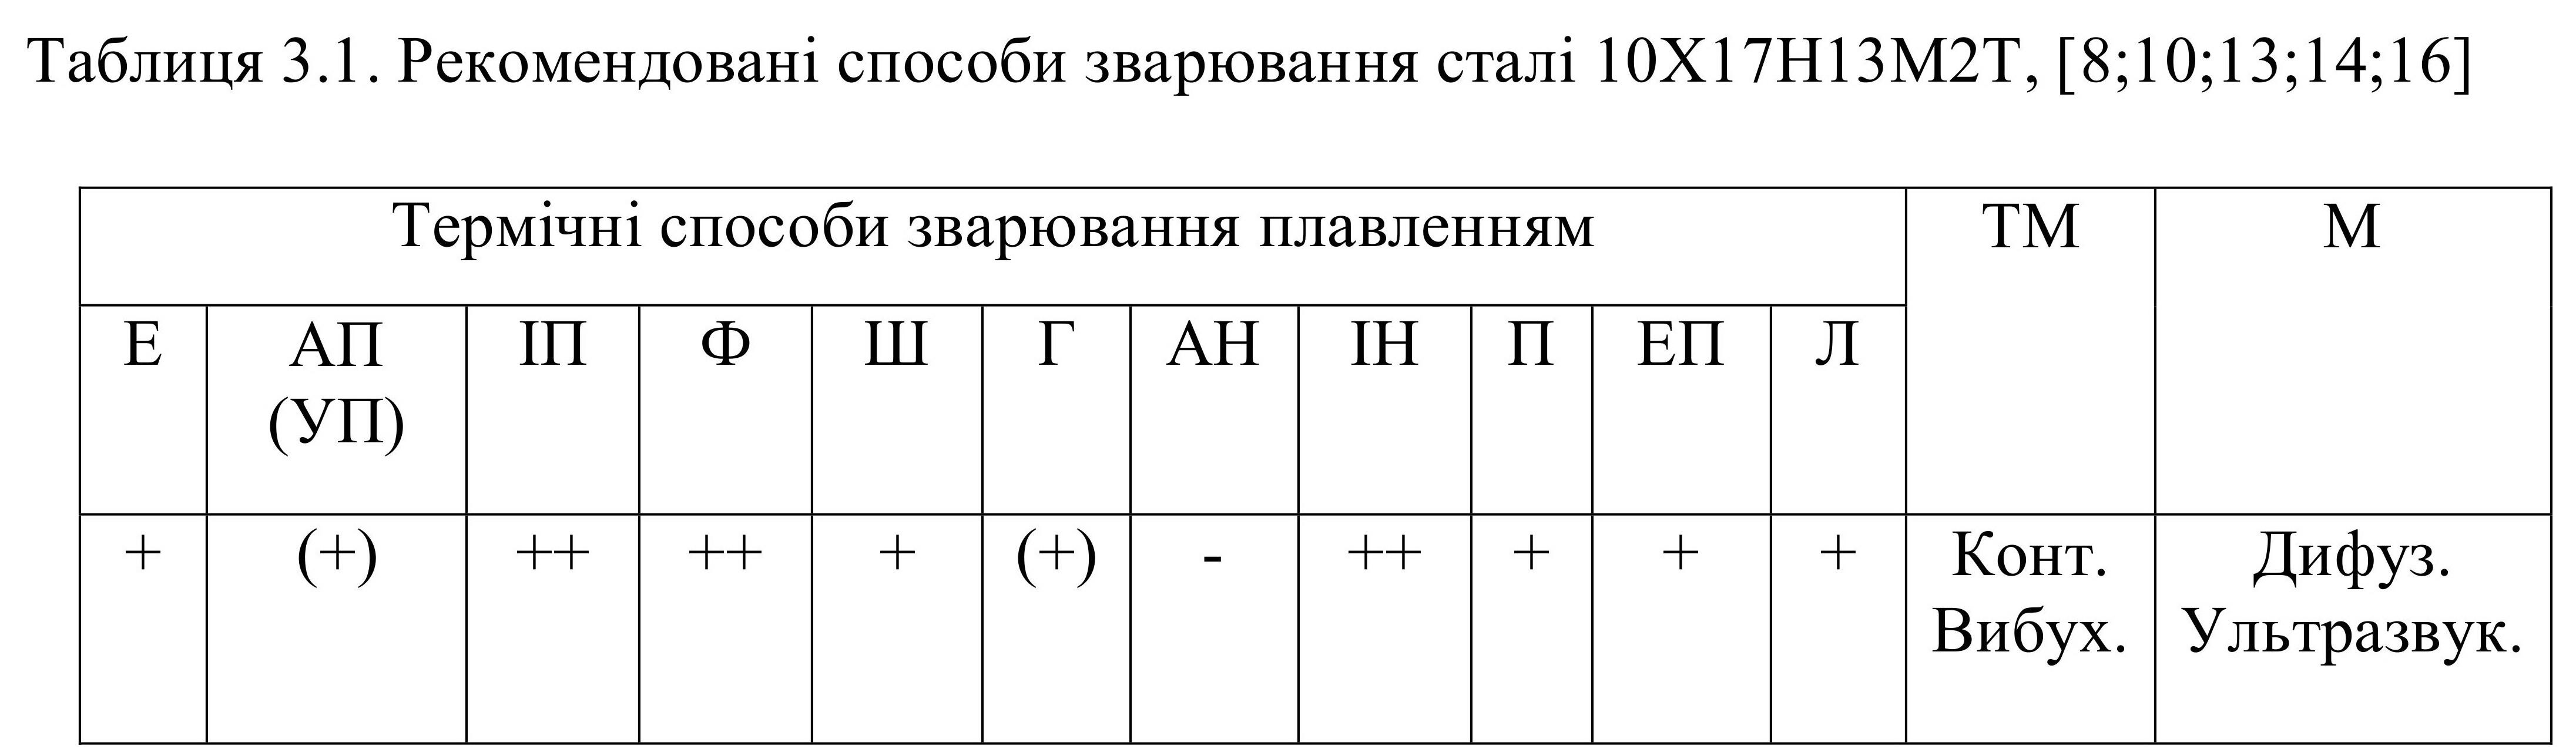 10х17н13м2т